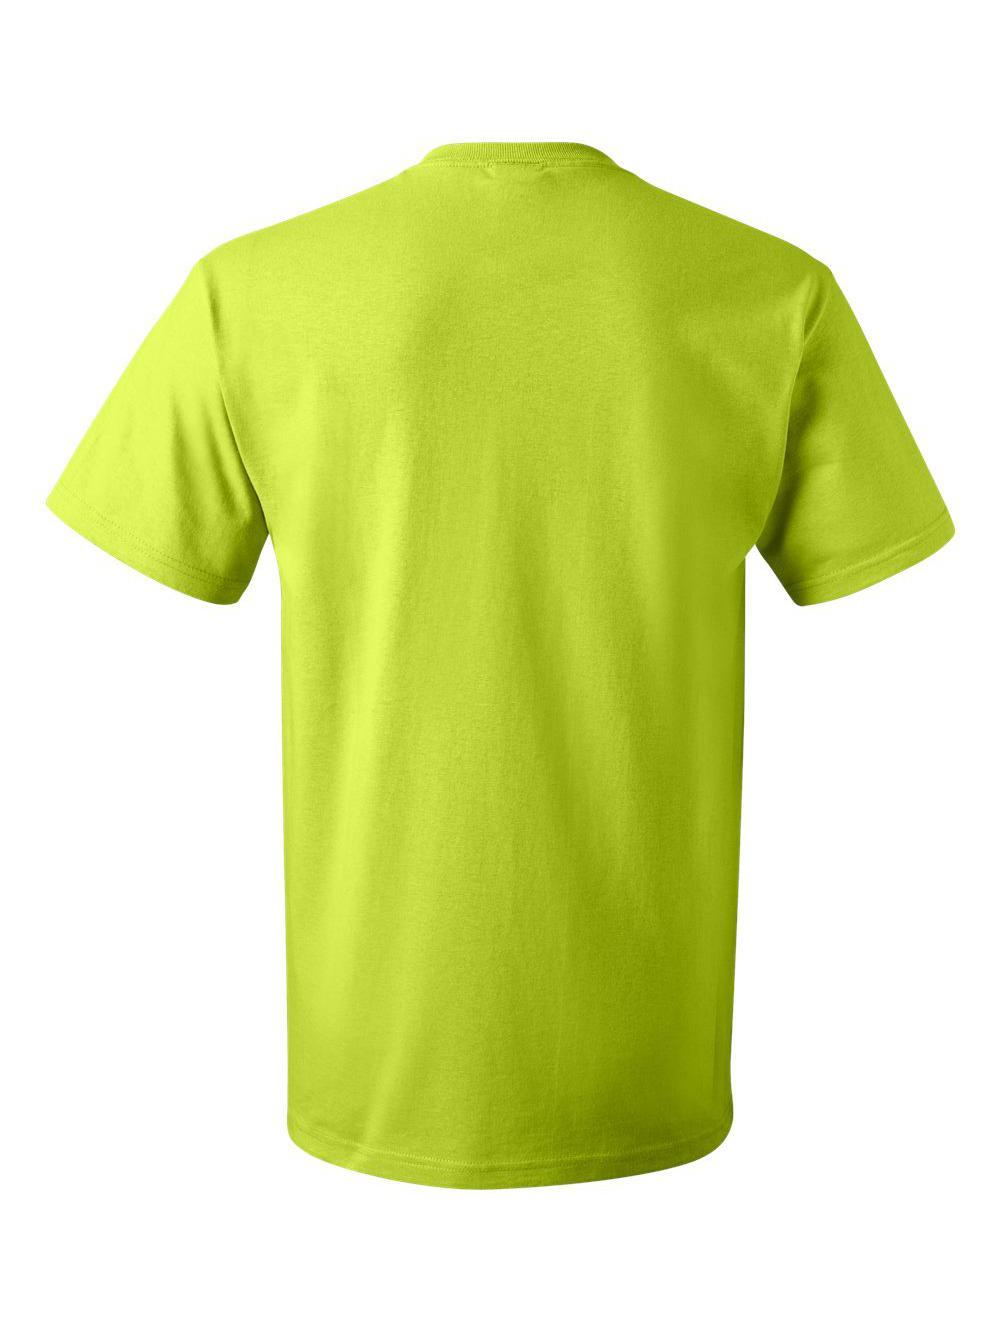 Fruit-of-the-Loom-HD-Cotton-Short-Sleeve-T-Shirt-3930R thumbnail 82